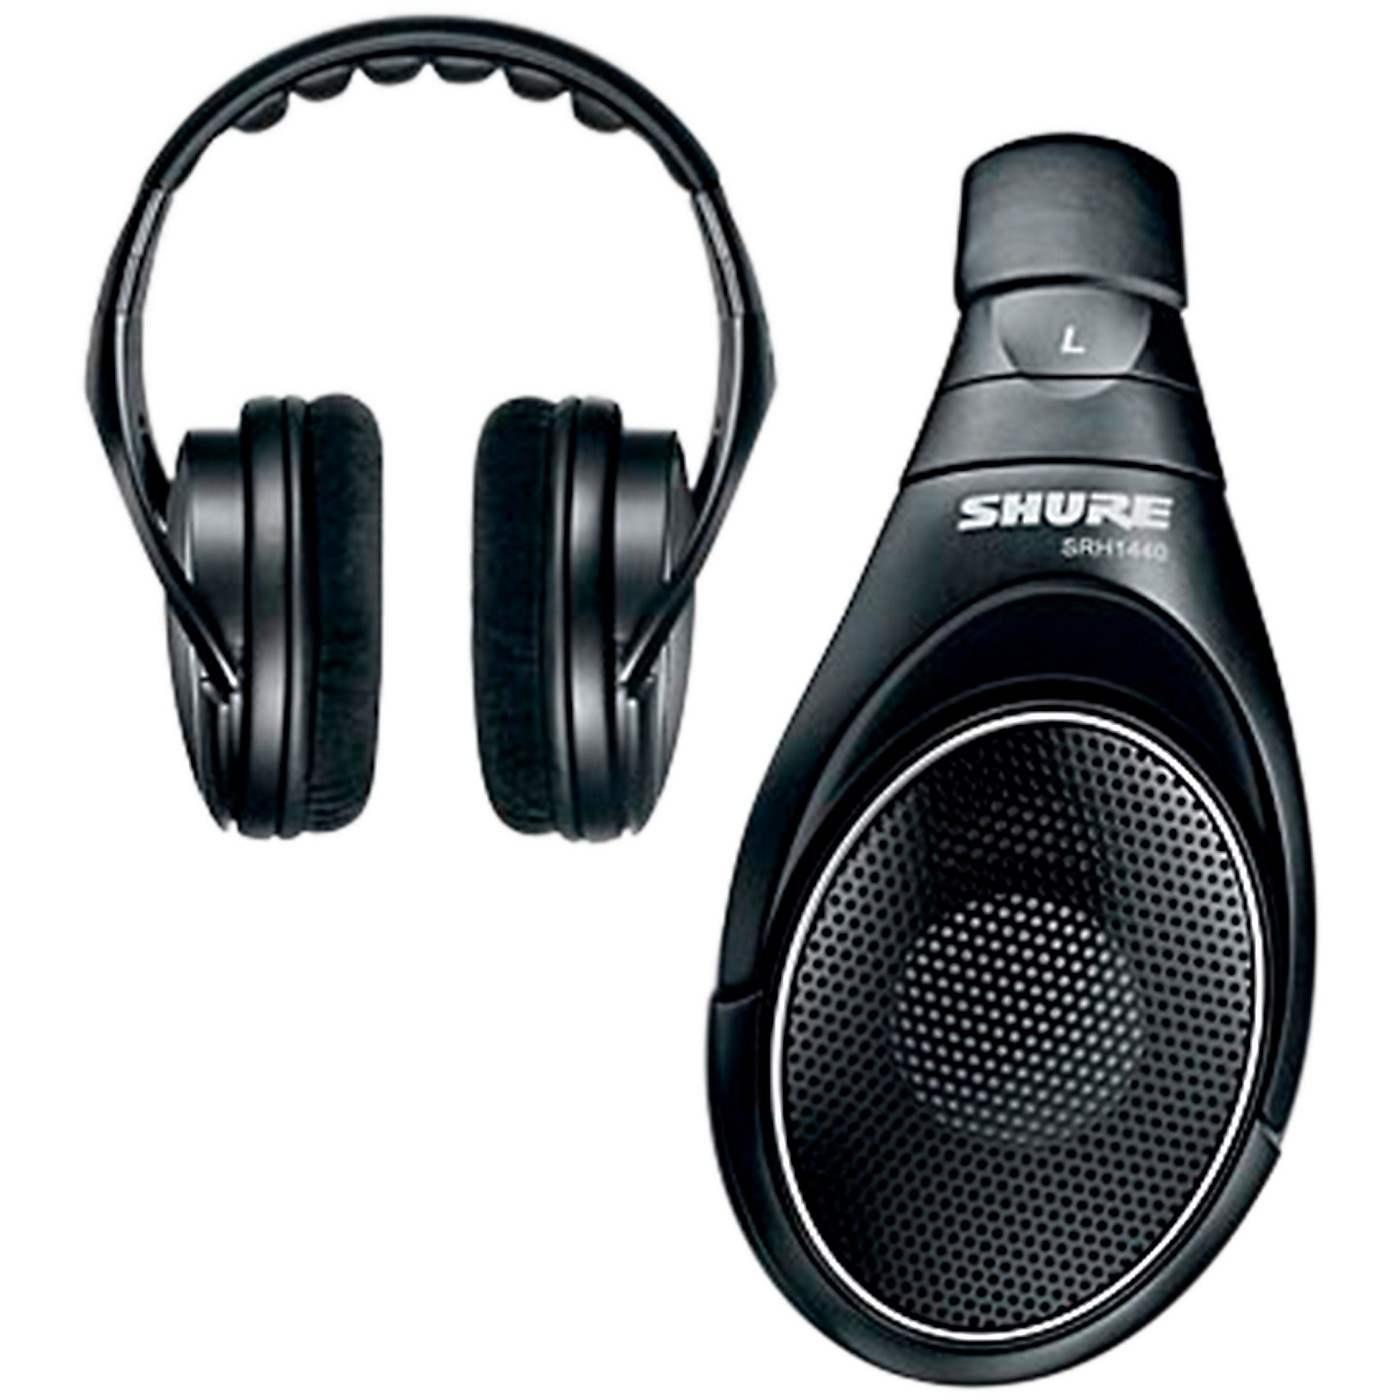 Shure SRH1440 Professional Open Back Headphones thumbnail